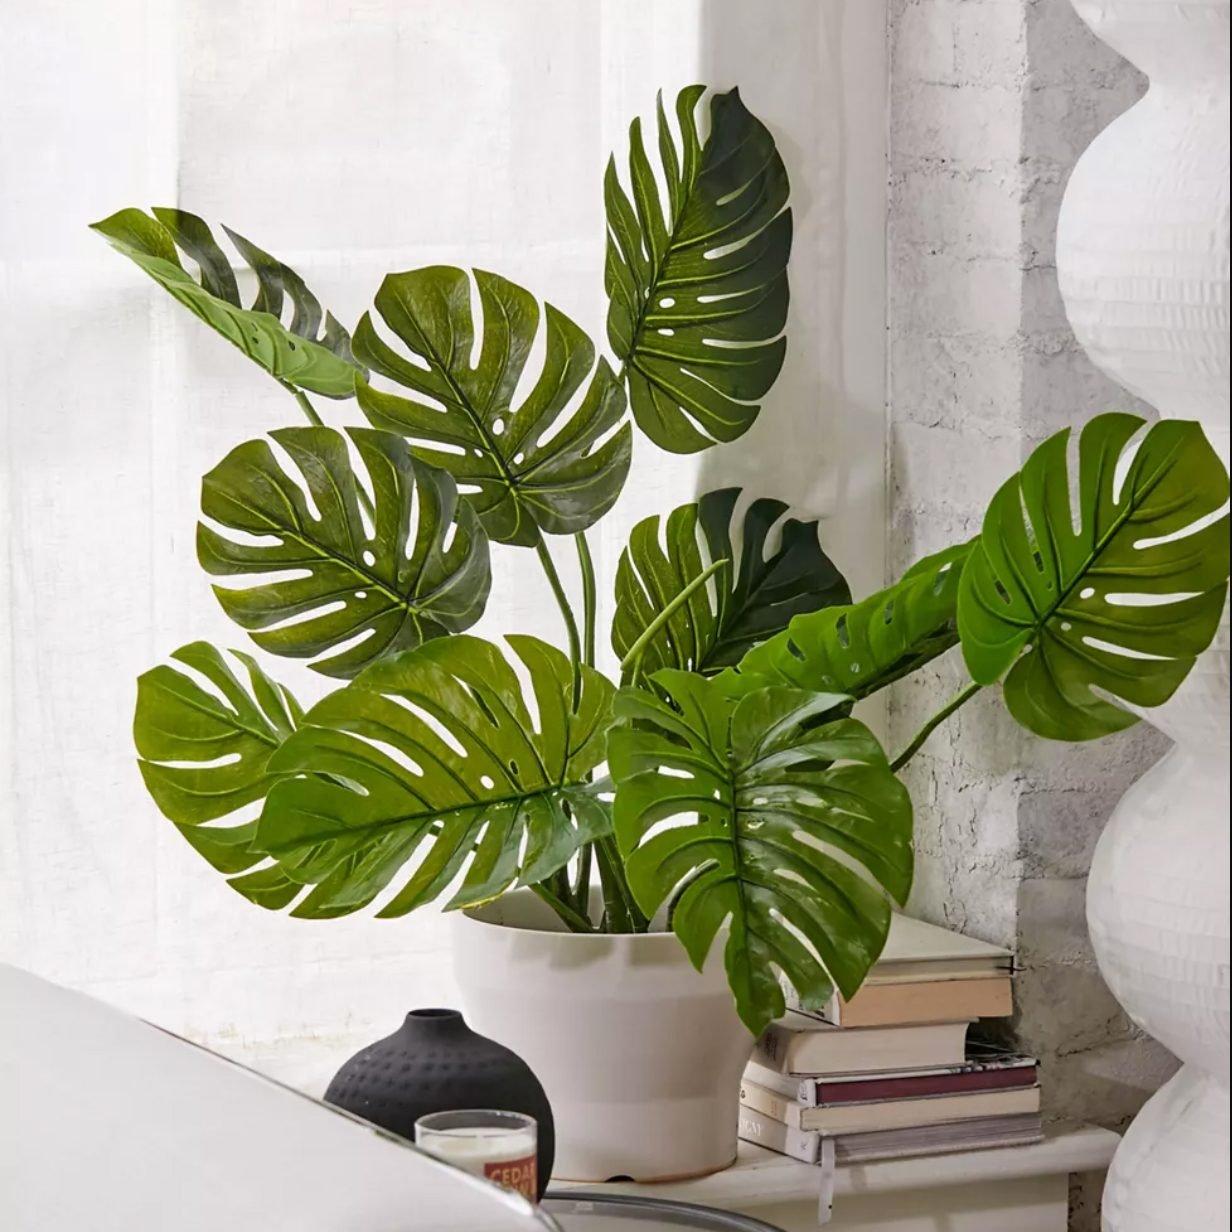 Fake monstera plant